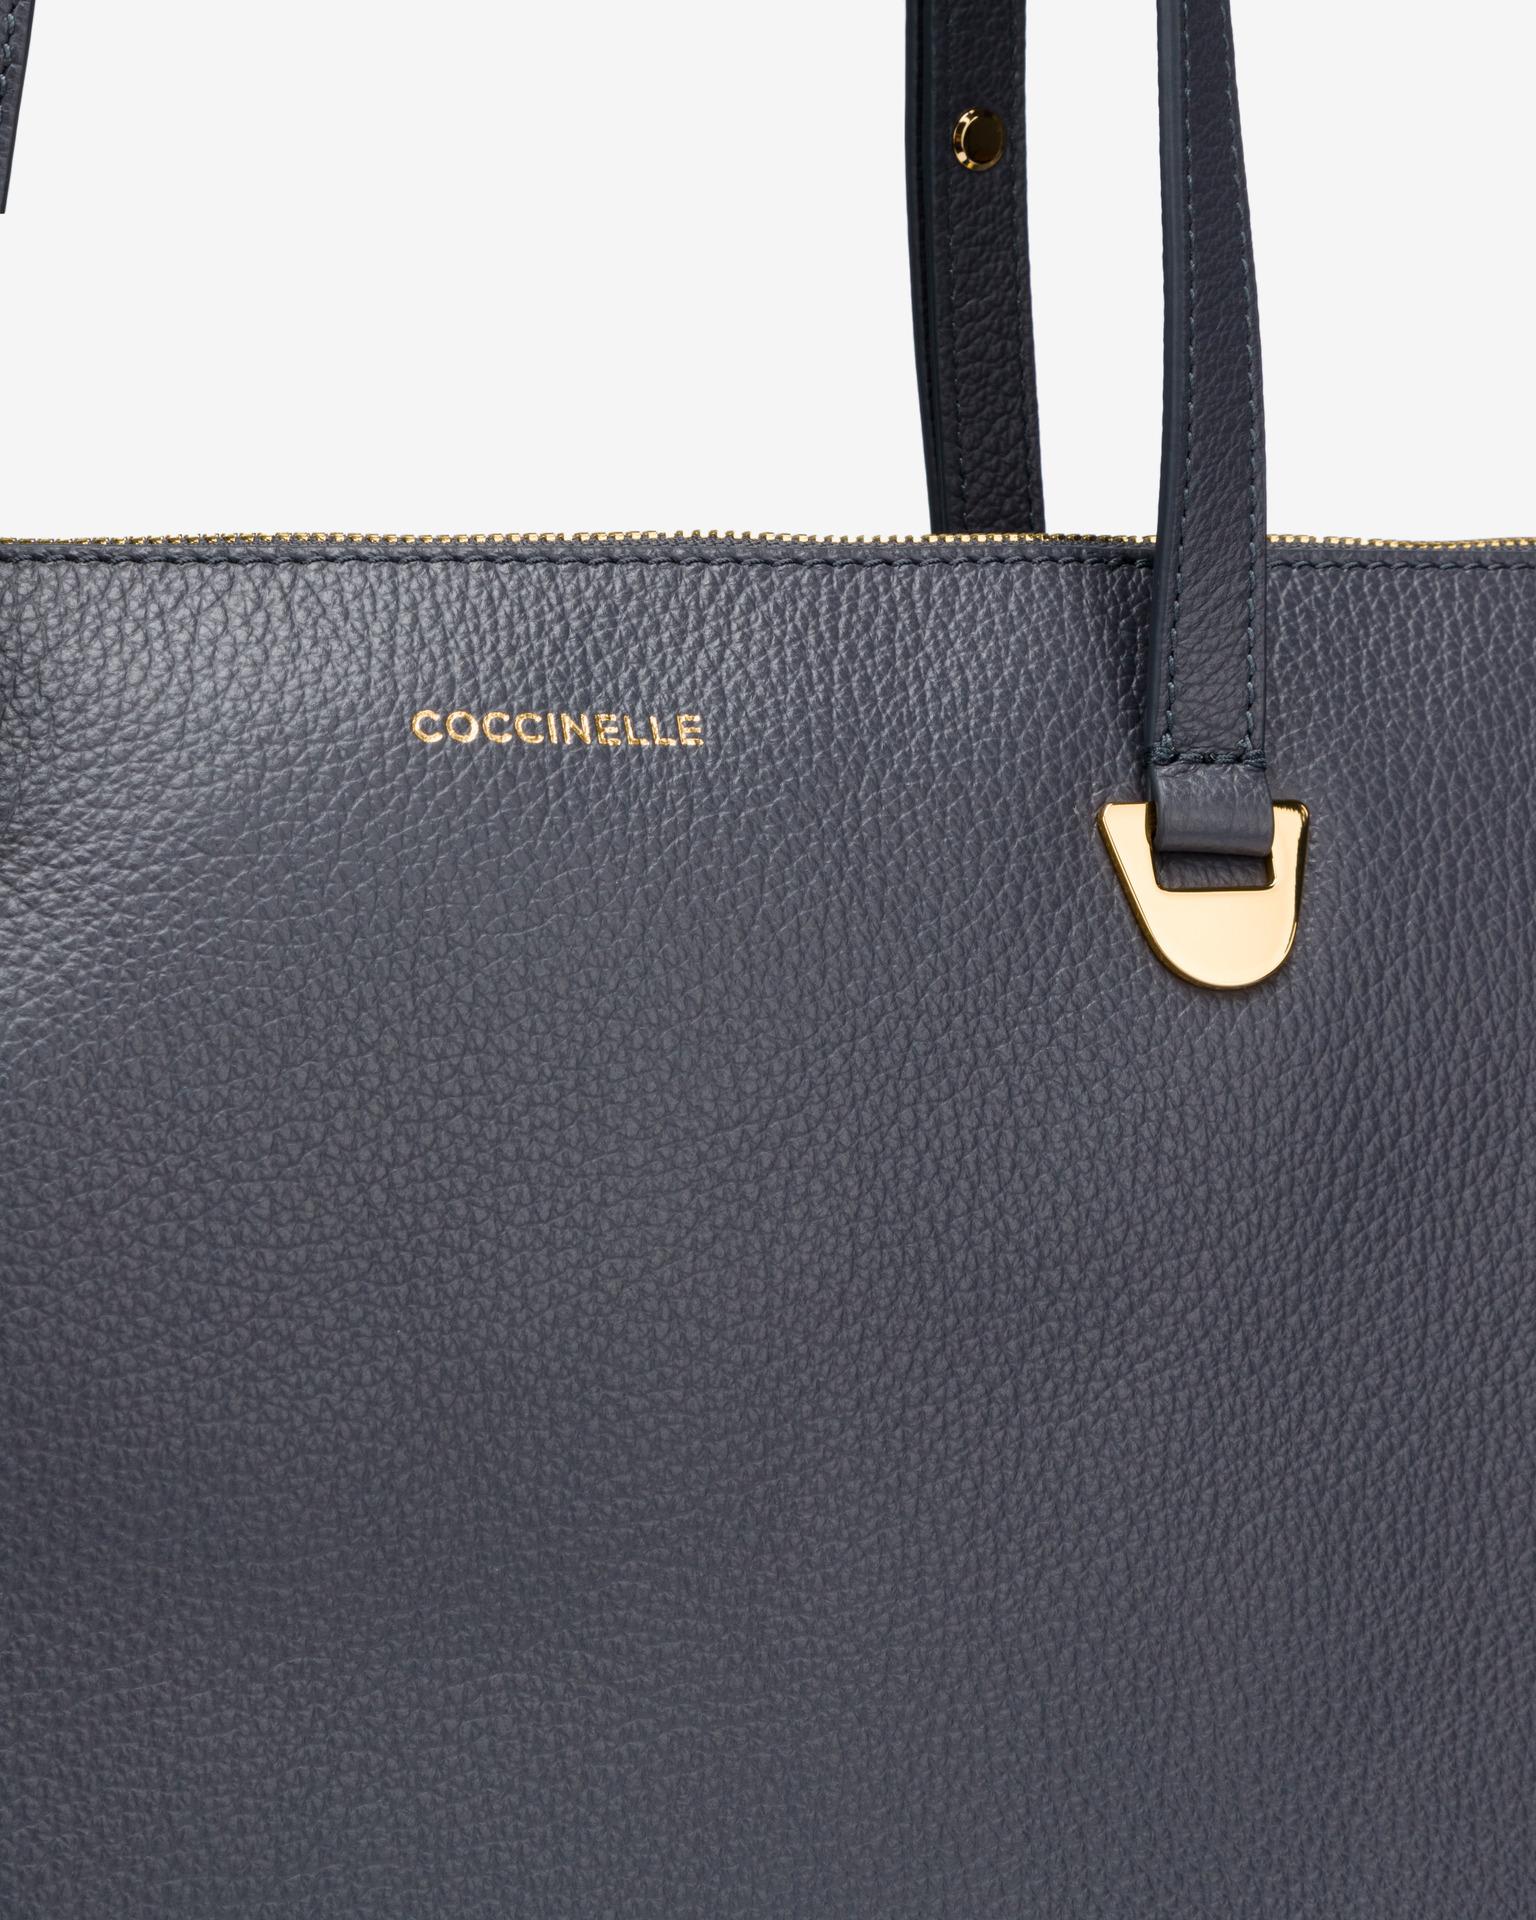 Coccinelle Borsetta donna blu Kabelka